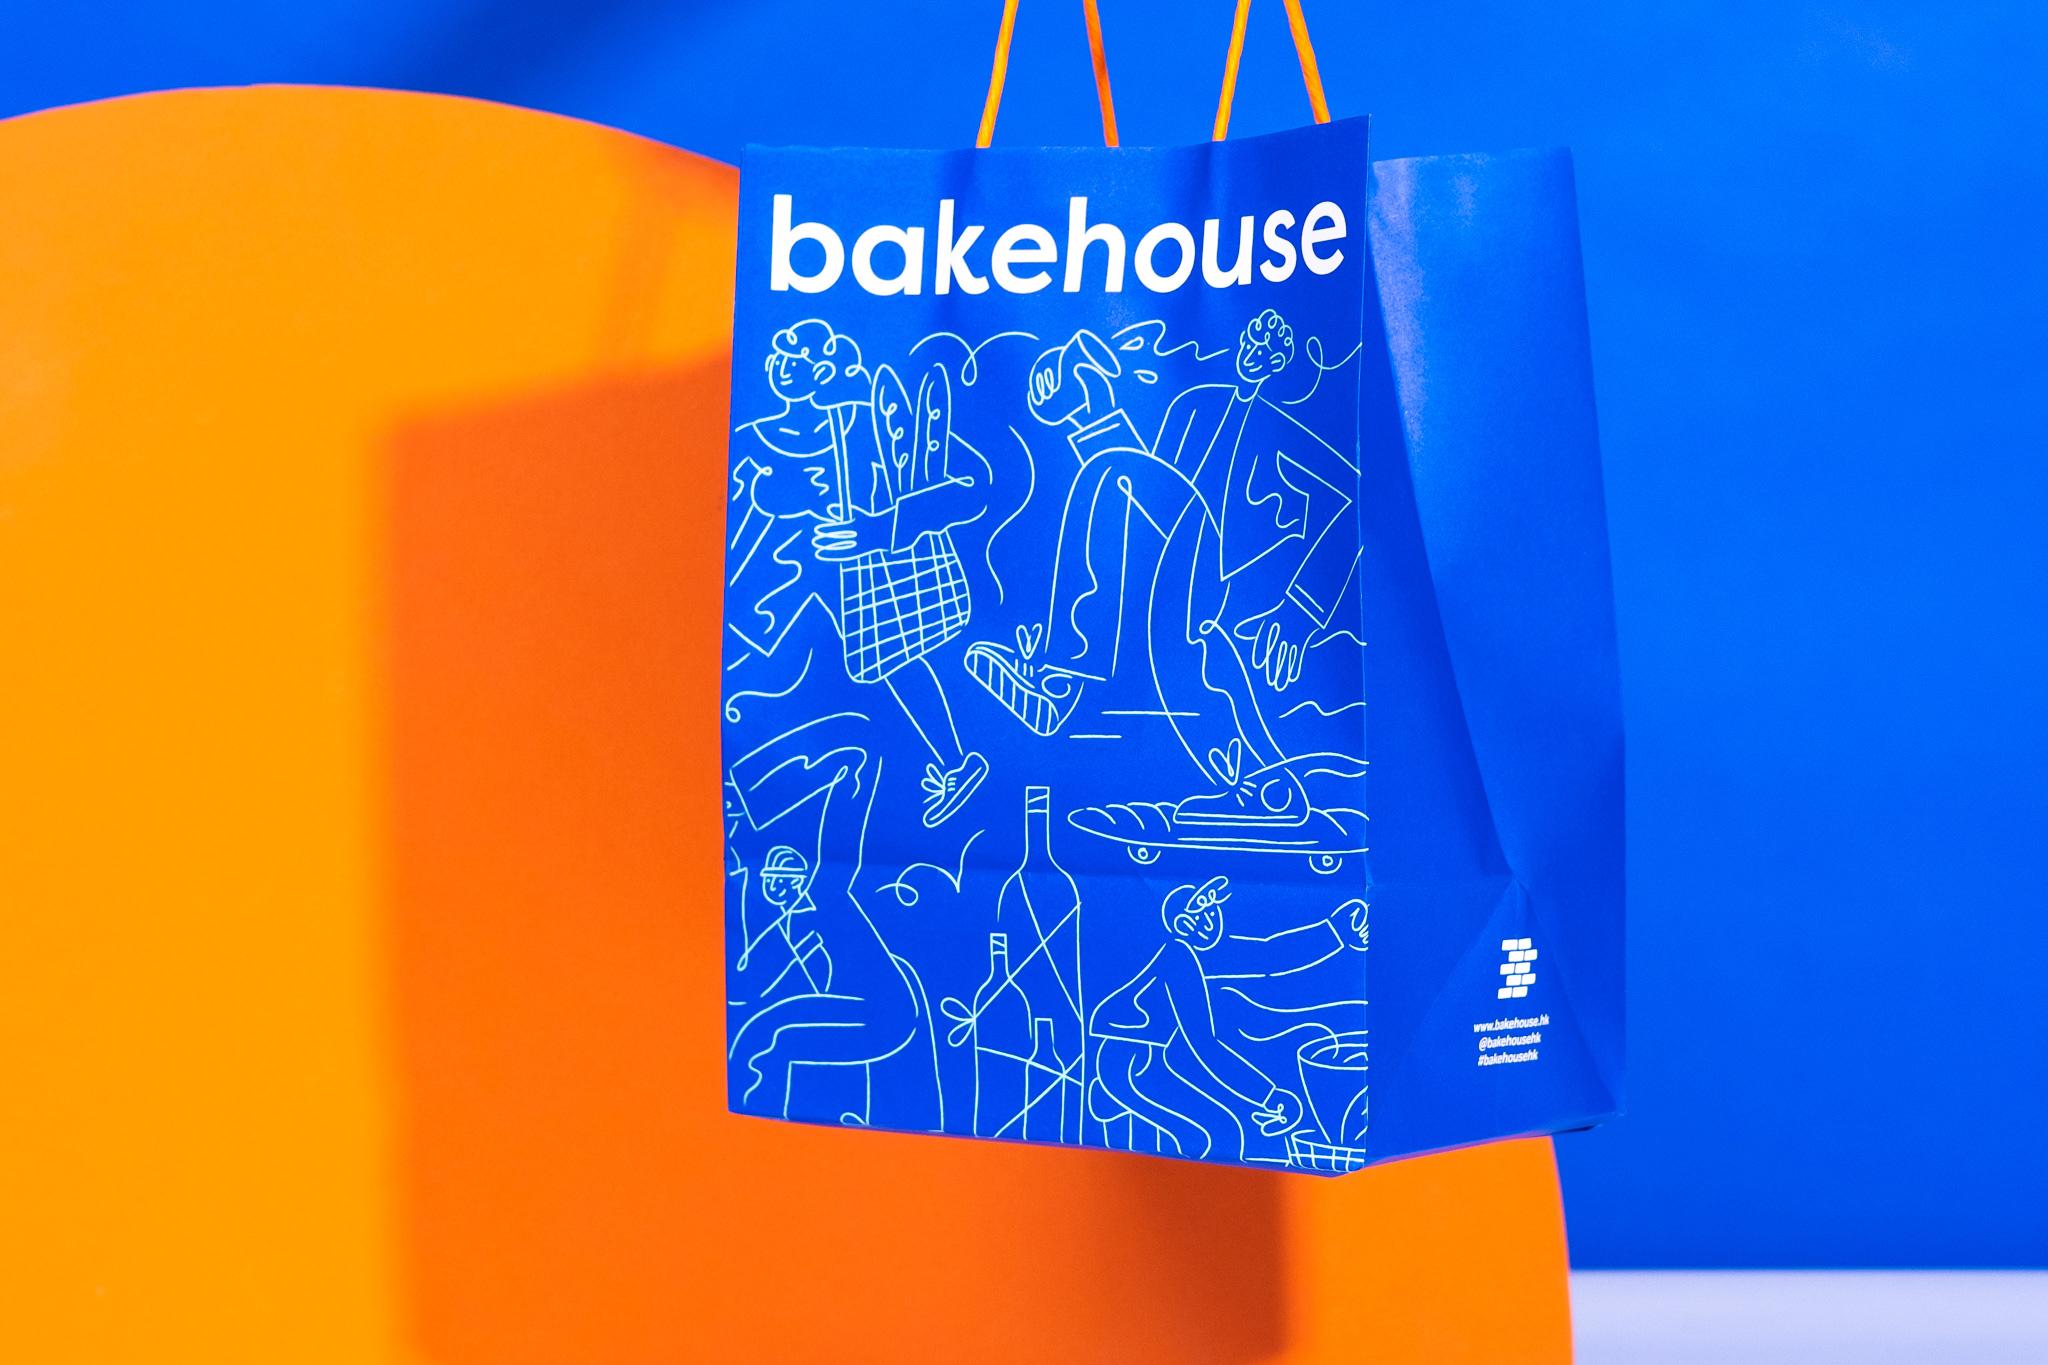 Bakehouse